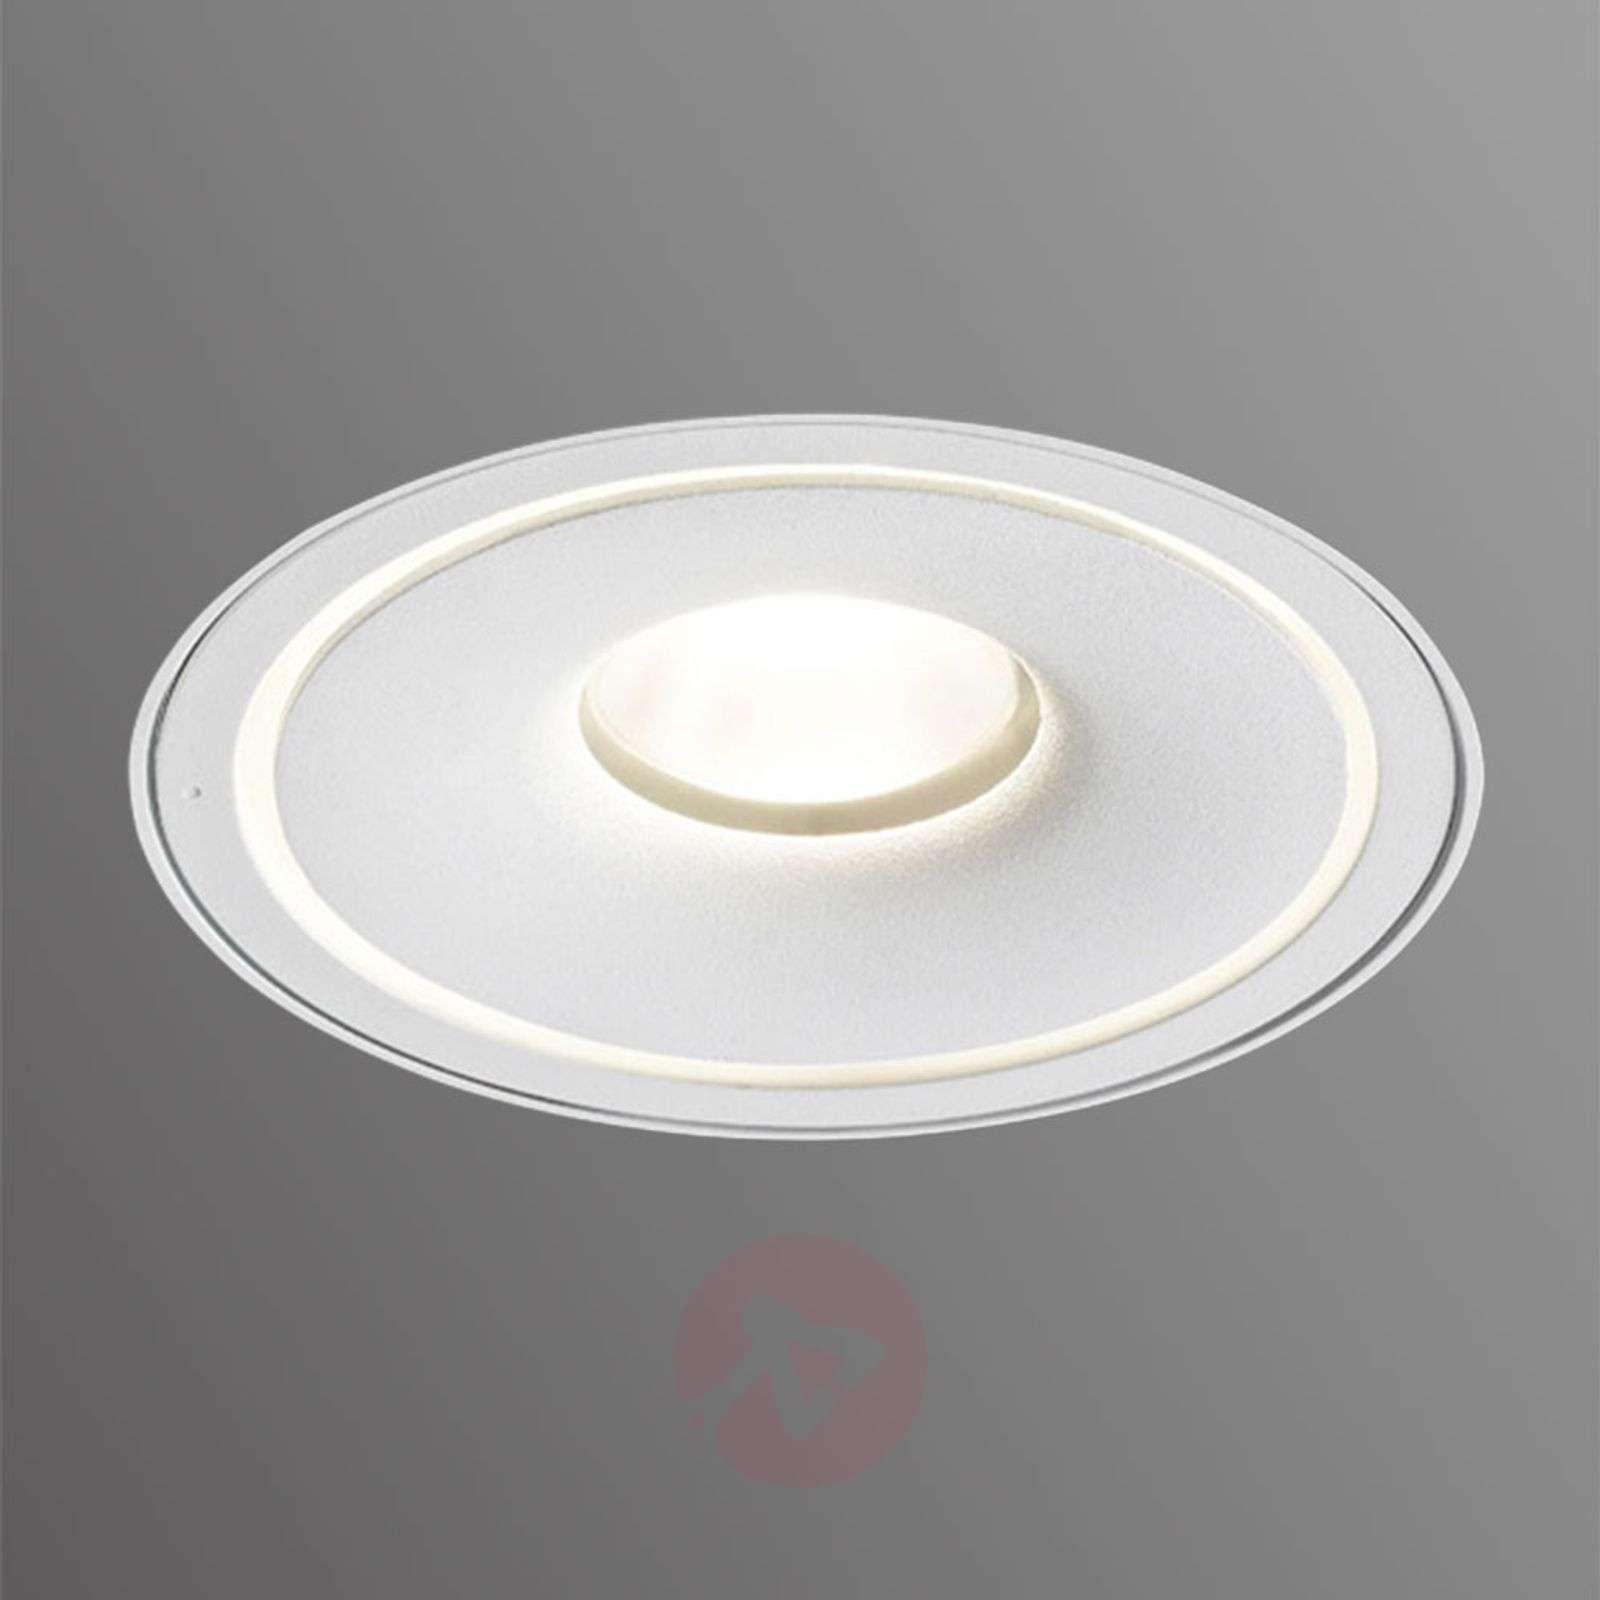 Led recessed light tweeter trimless reo 3033 lights led recessed light tweeter trimless reo 3033 2520001 01 aloadofball Choice Image